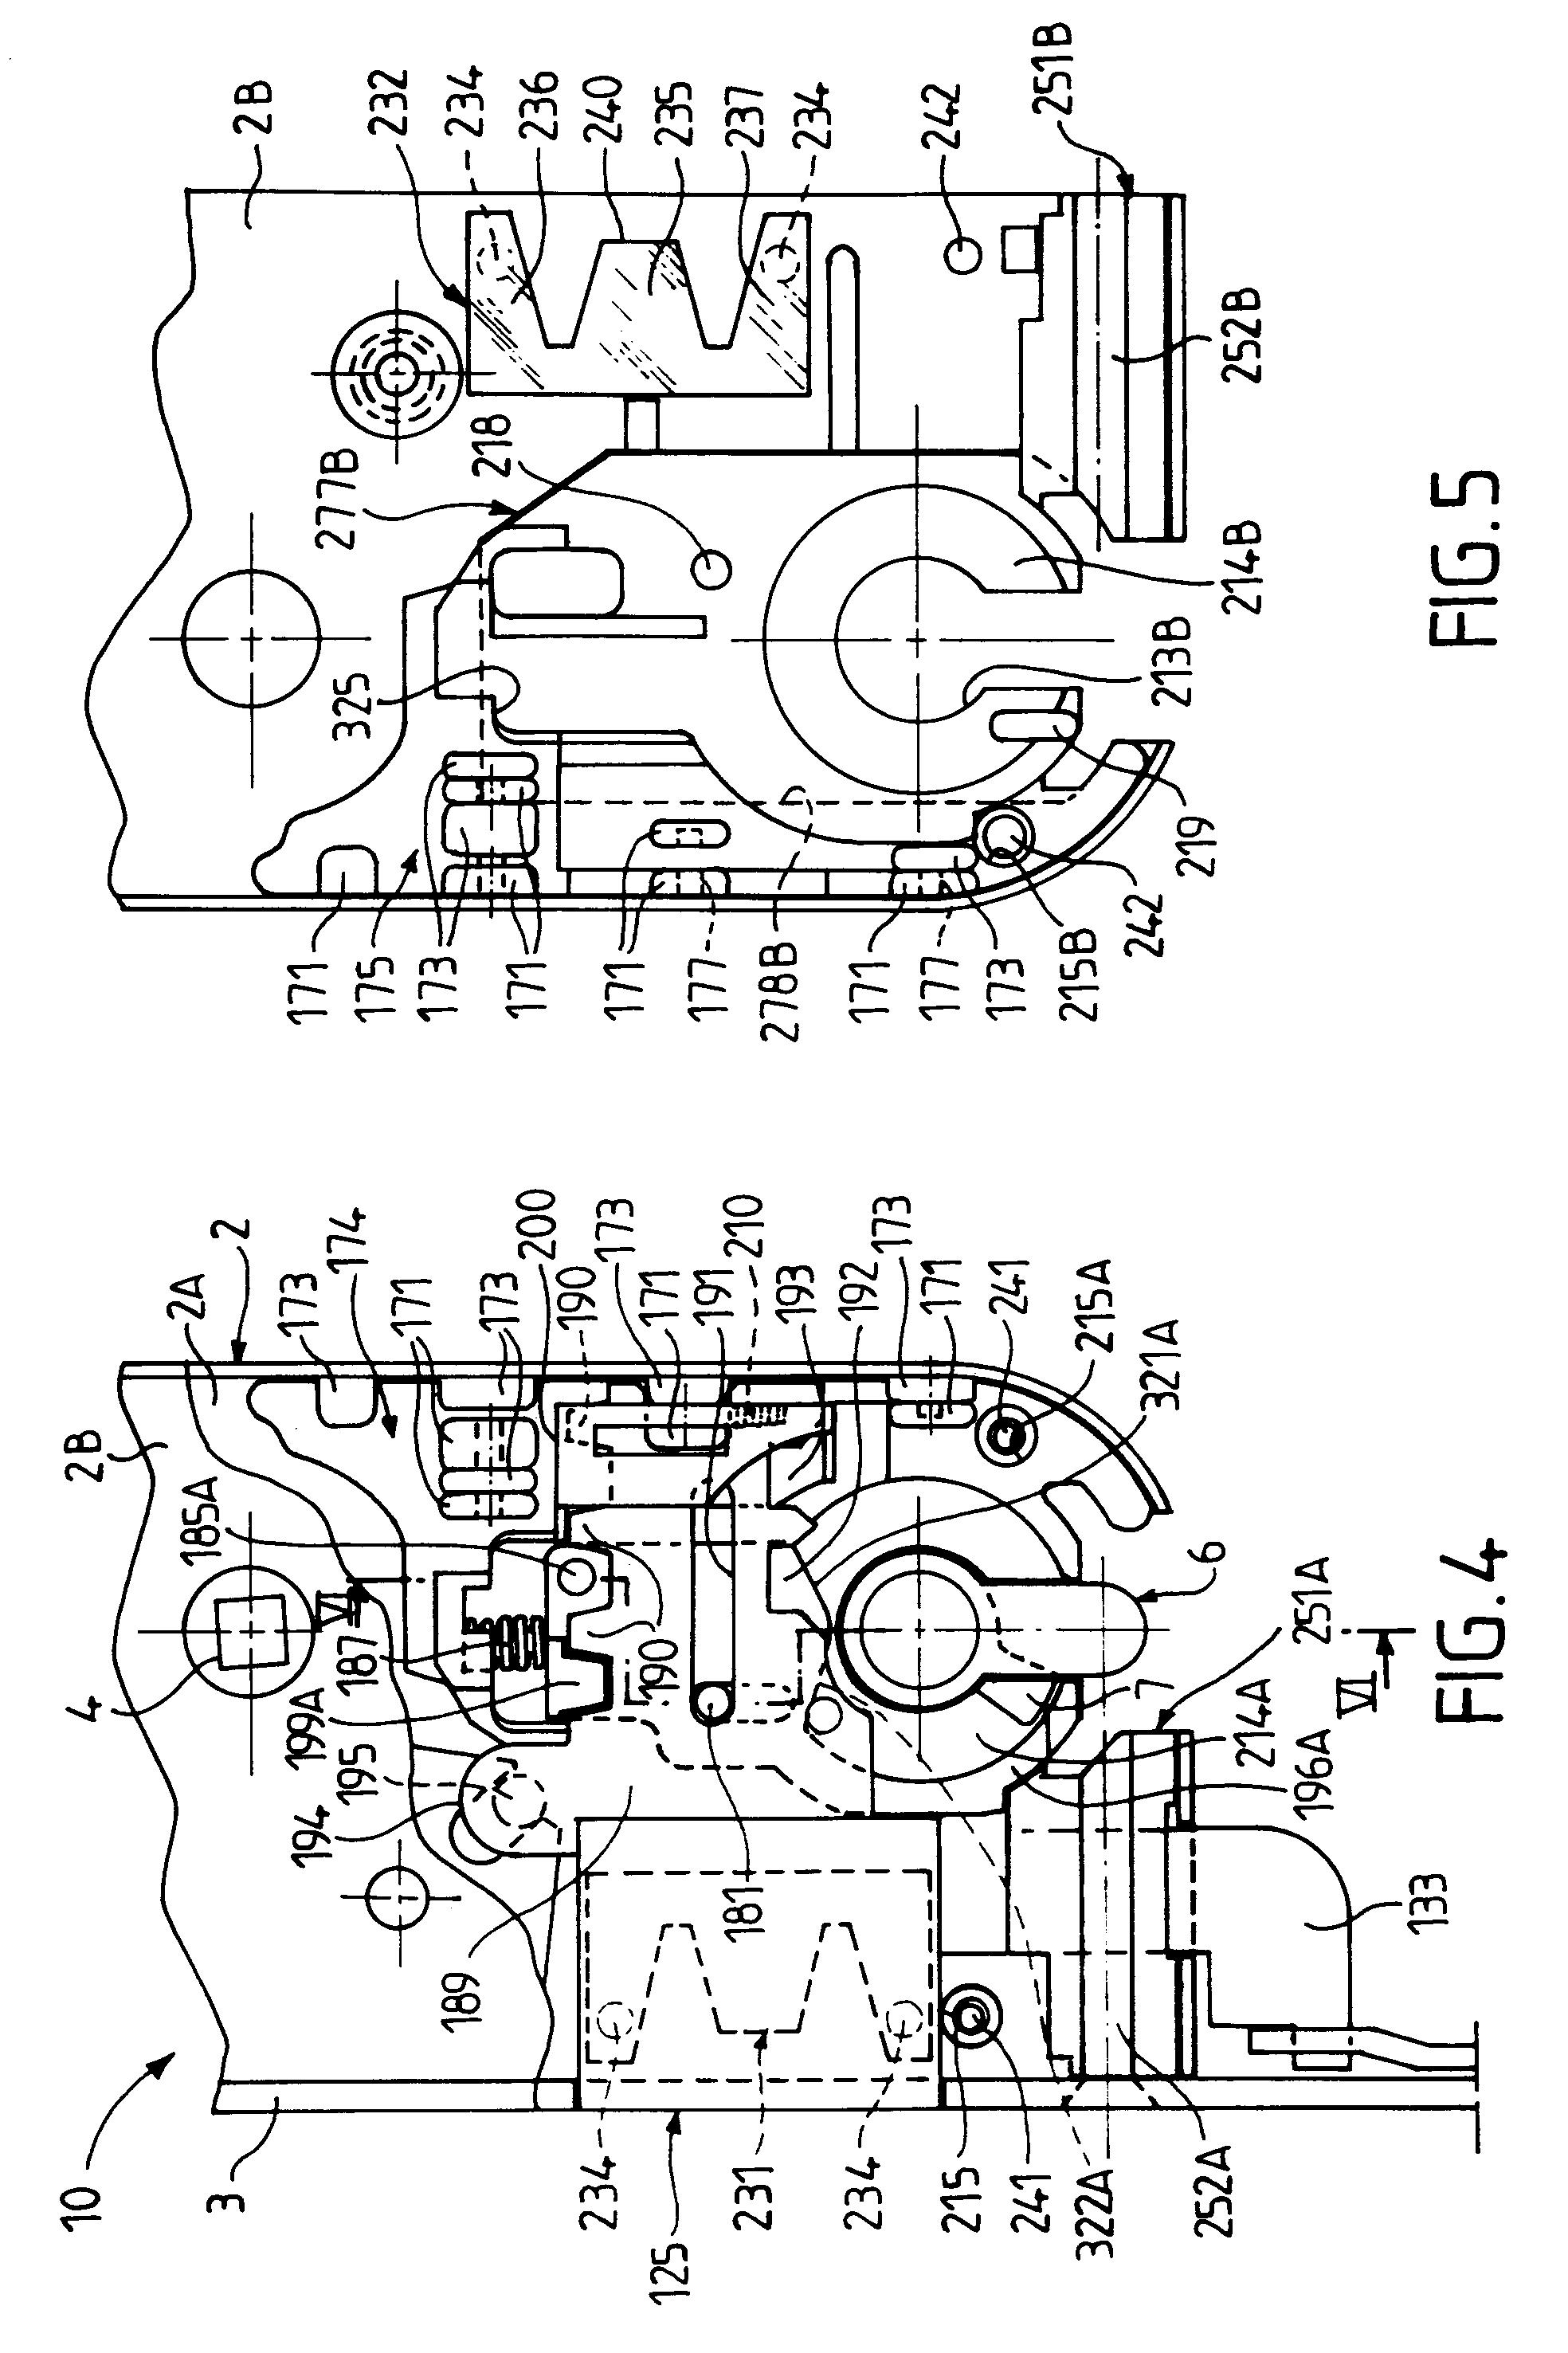 patente ep0651116a1 serrure de porte quip e d 39 un dispositif de protection google patentes. Black Bedroom Furniture Sets. Home Design Ideas